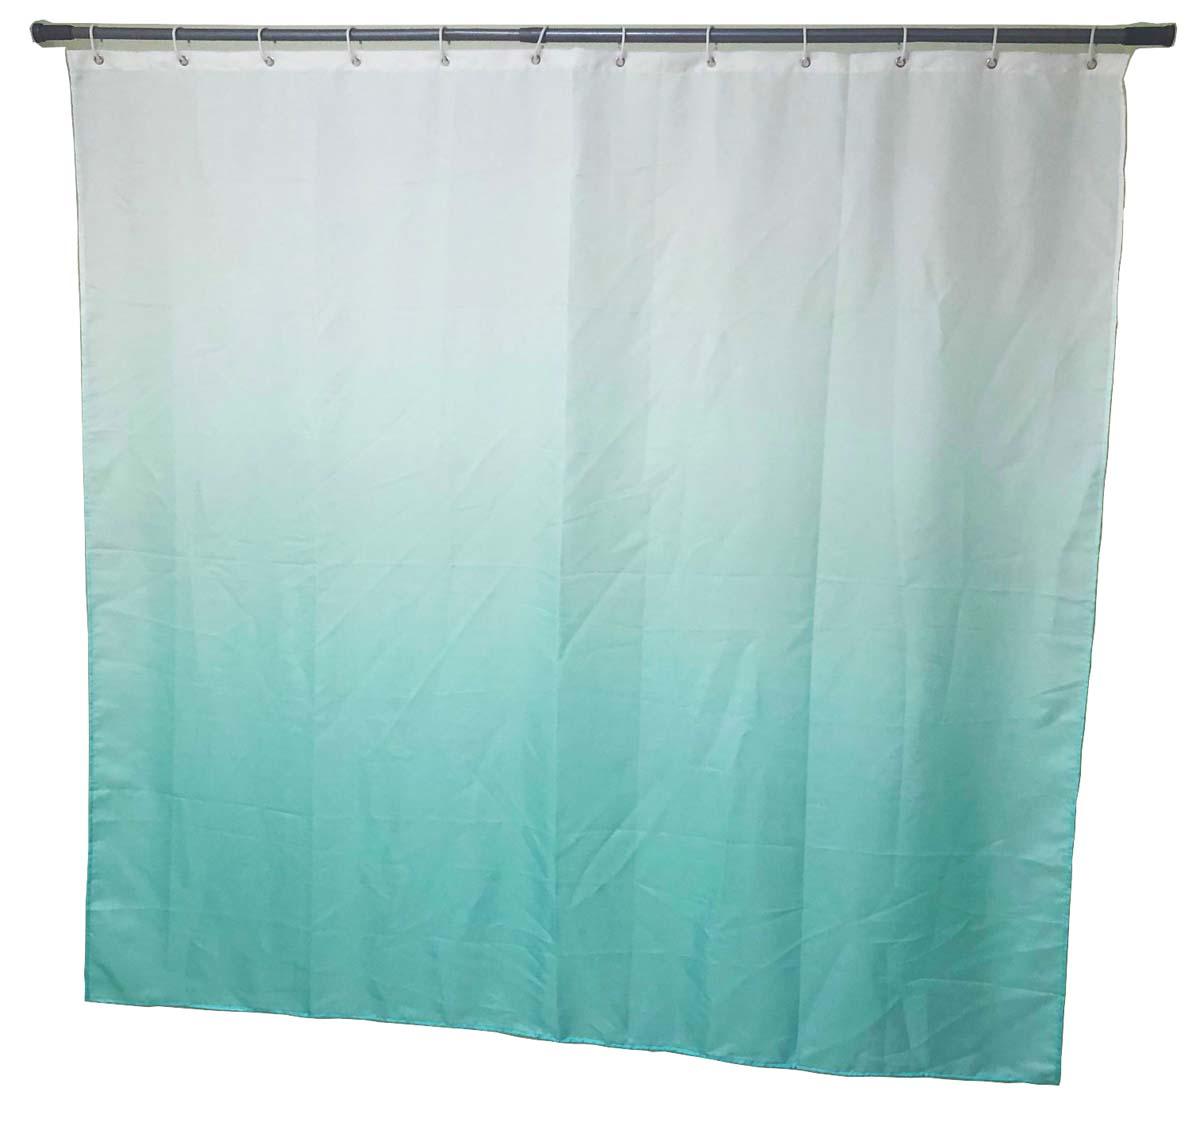 все цены на Штора для ванной Swensa Gradient, цвет: голубой, 180 х 180 см онлайн